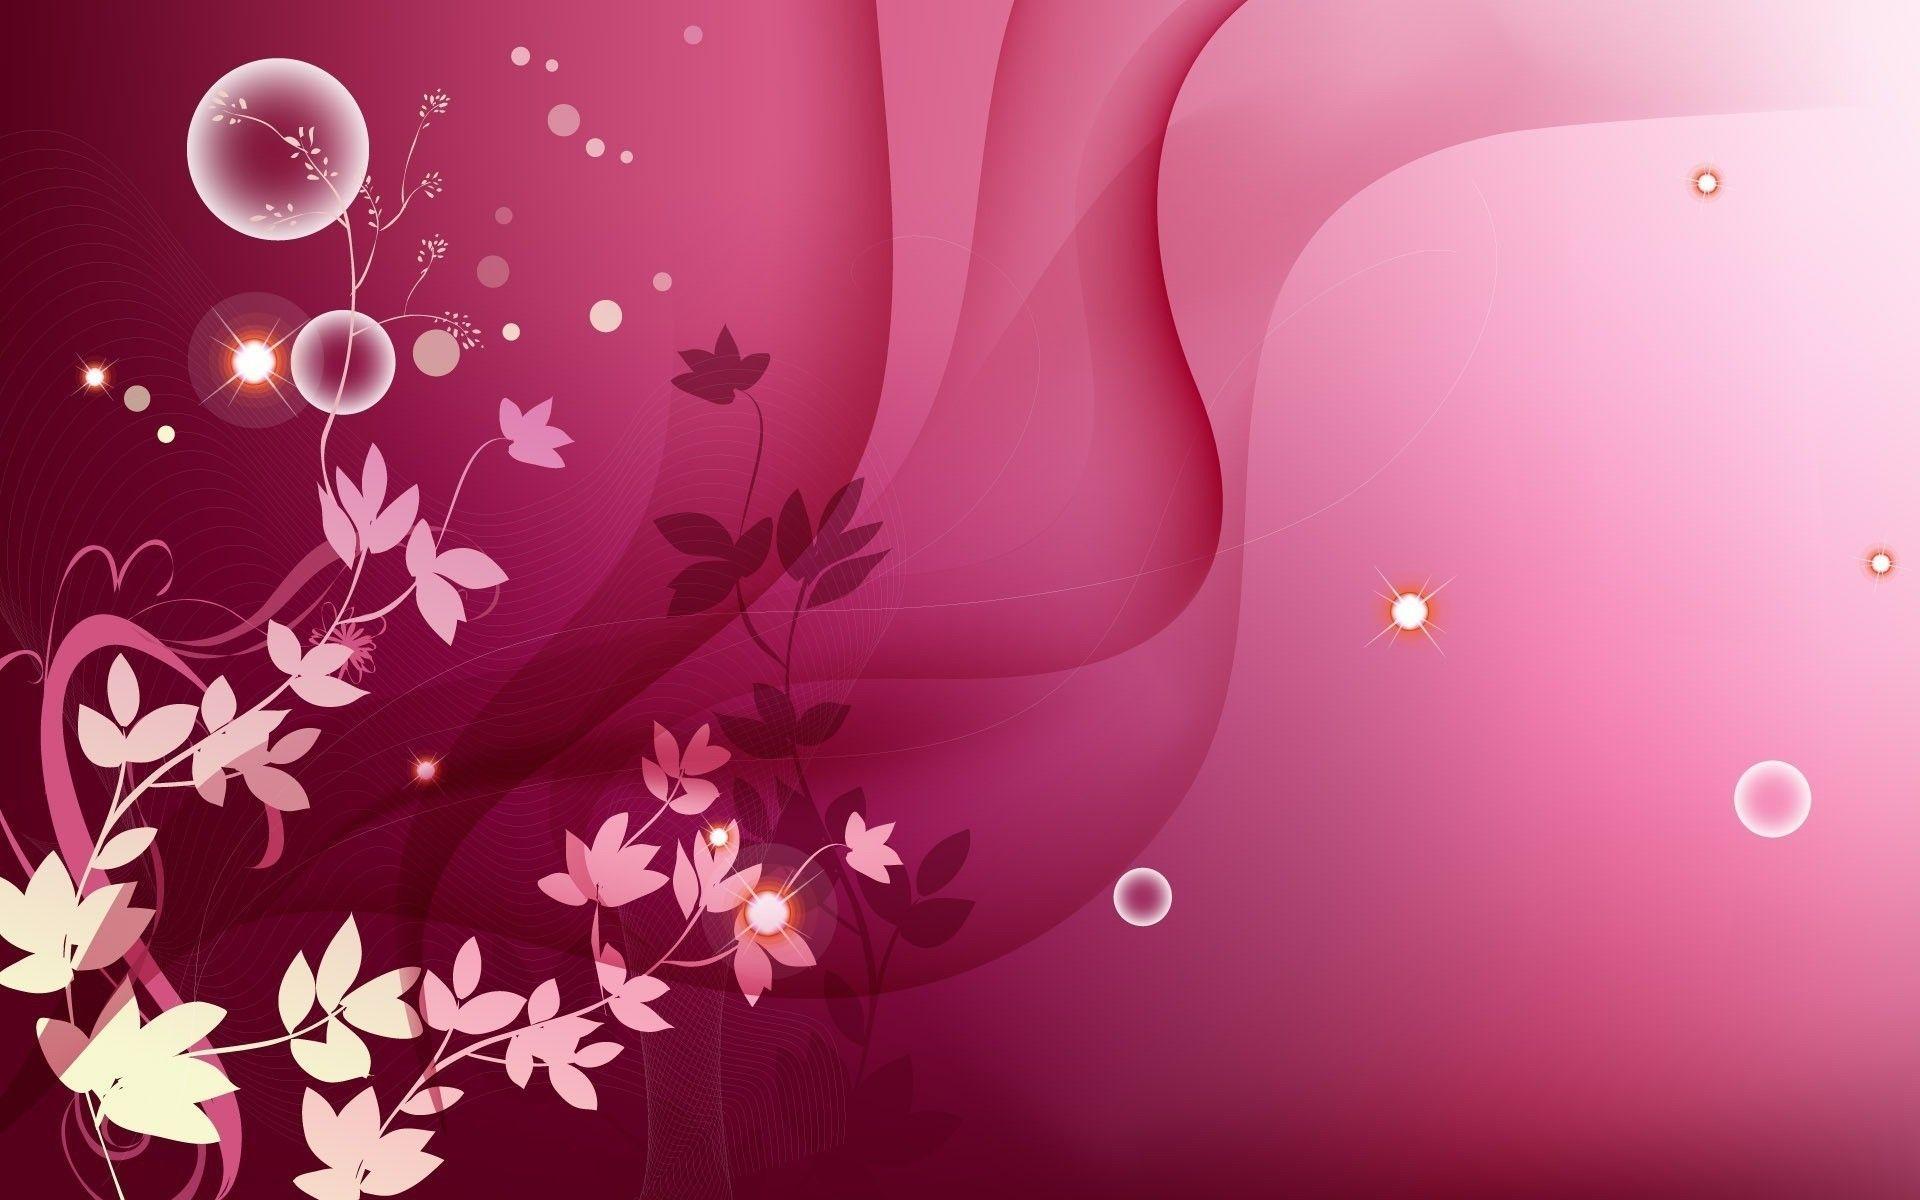 Magenta Xfinity Com Search Pink Wallpaper Desktop Pink Background Images Pink Wallpaper